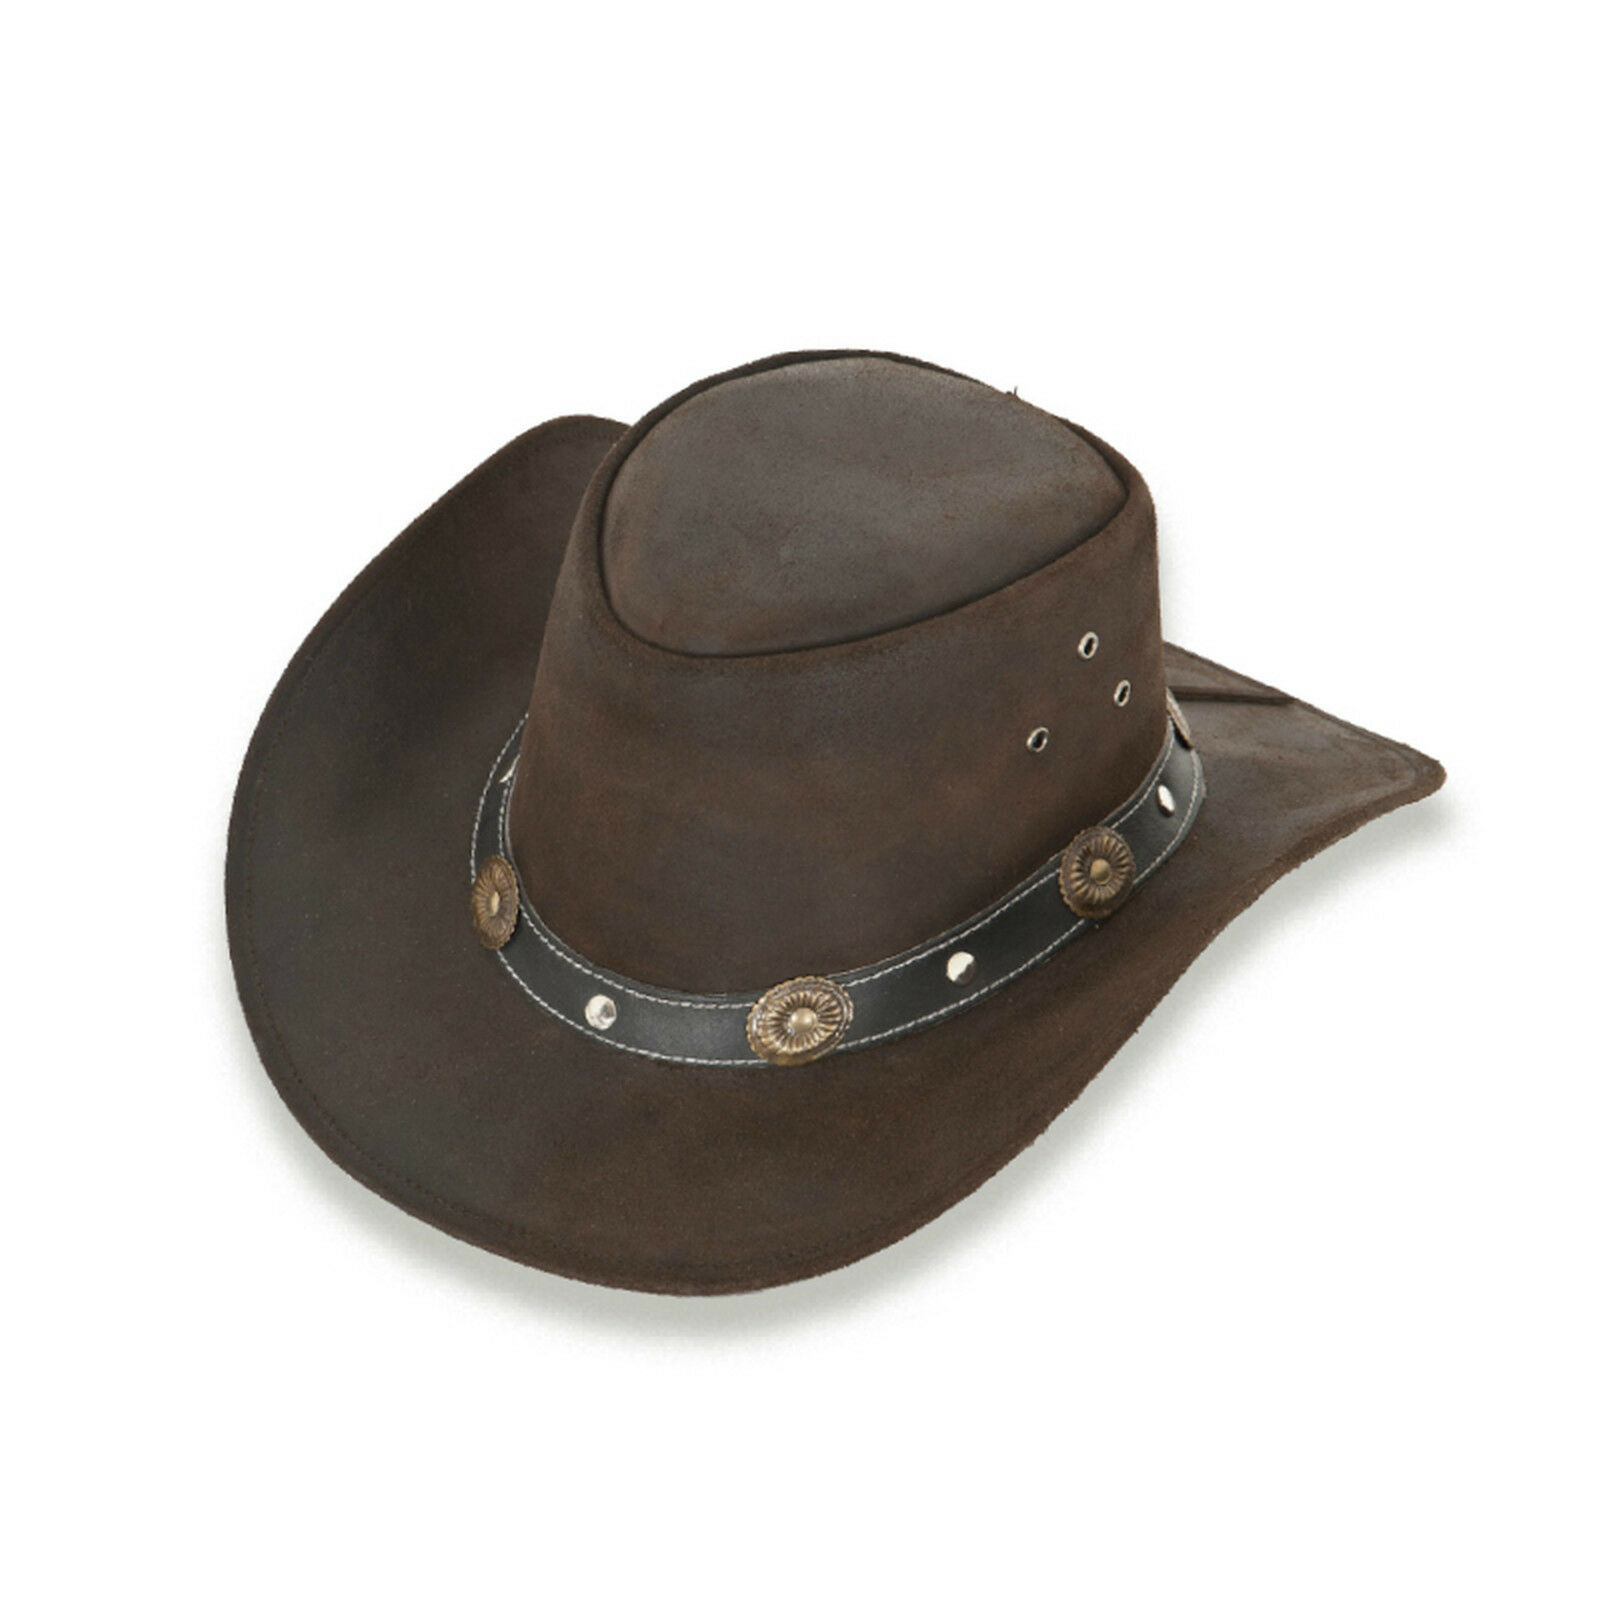 Lodenhut reno australia Leather ha sombrero vaquero lederhut vaquero country sombrero